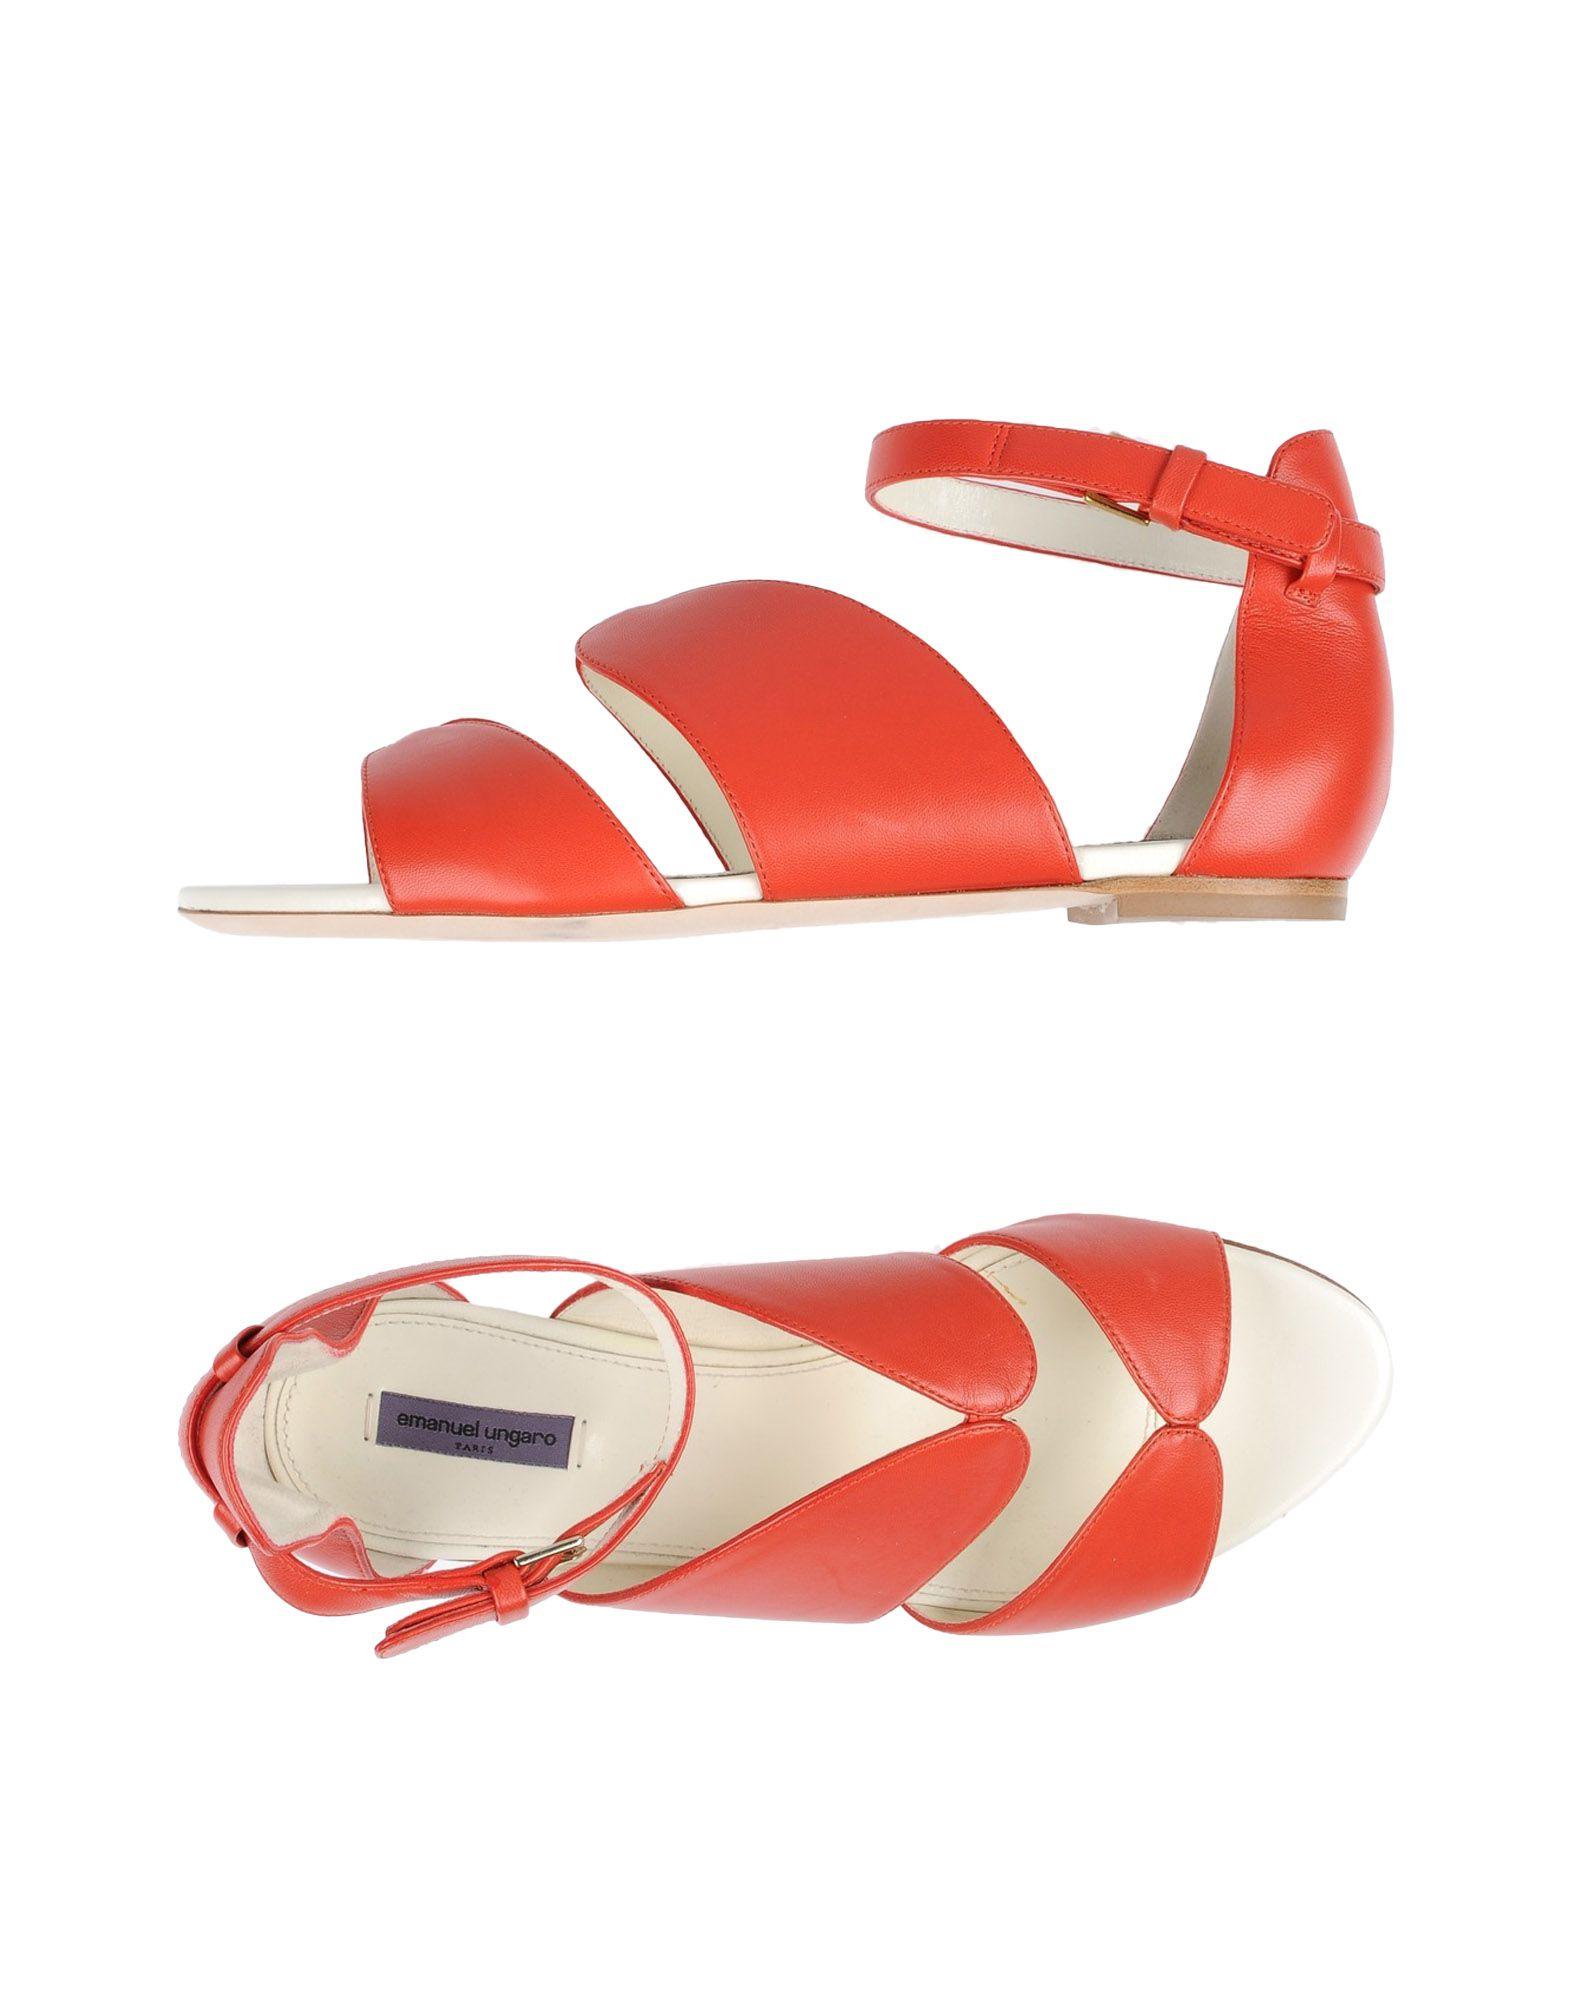 Emanuel Ungaro Sandalen Damen  11339246LL Gute Qualität beliebte Schuhe